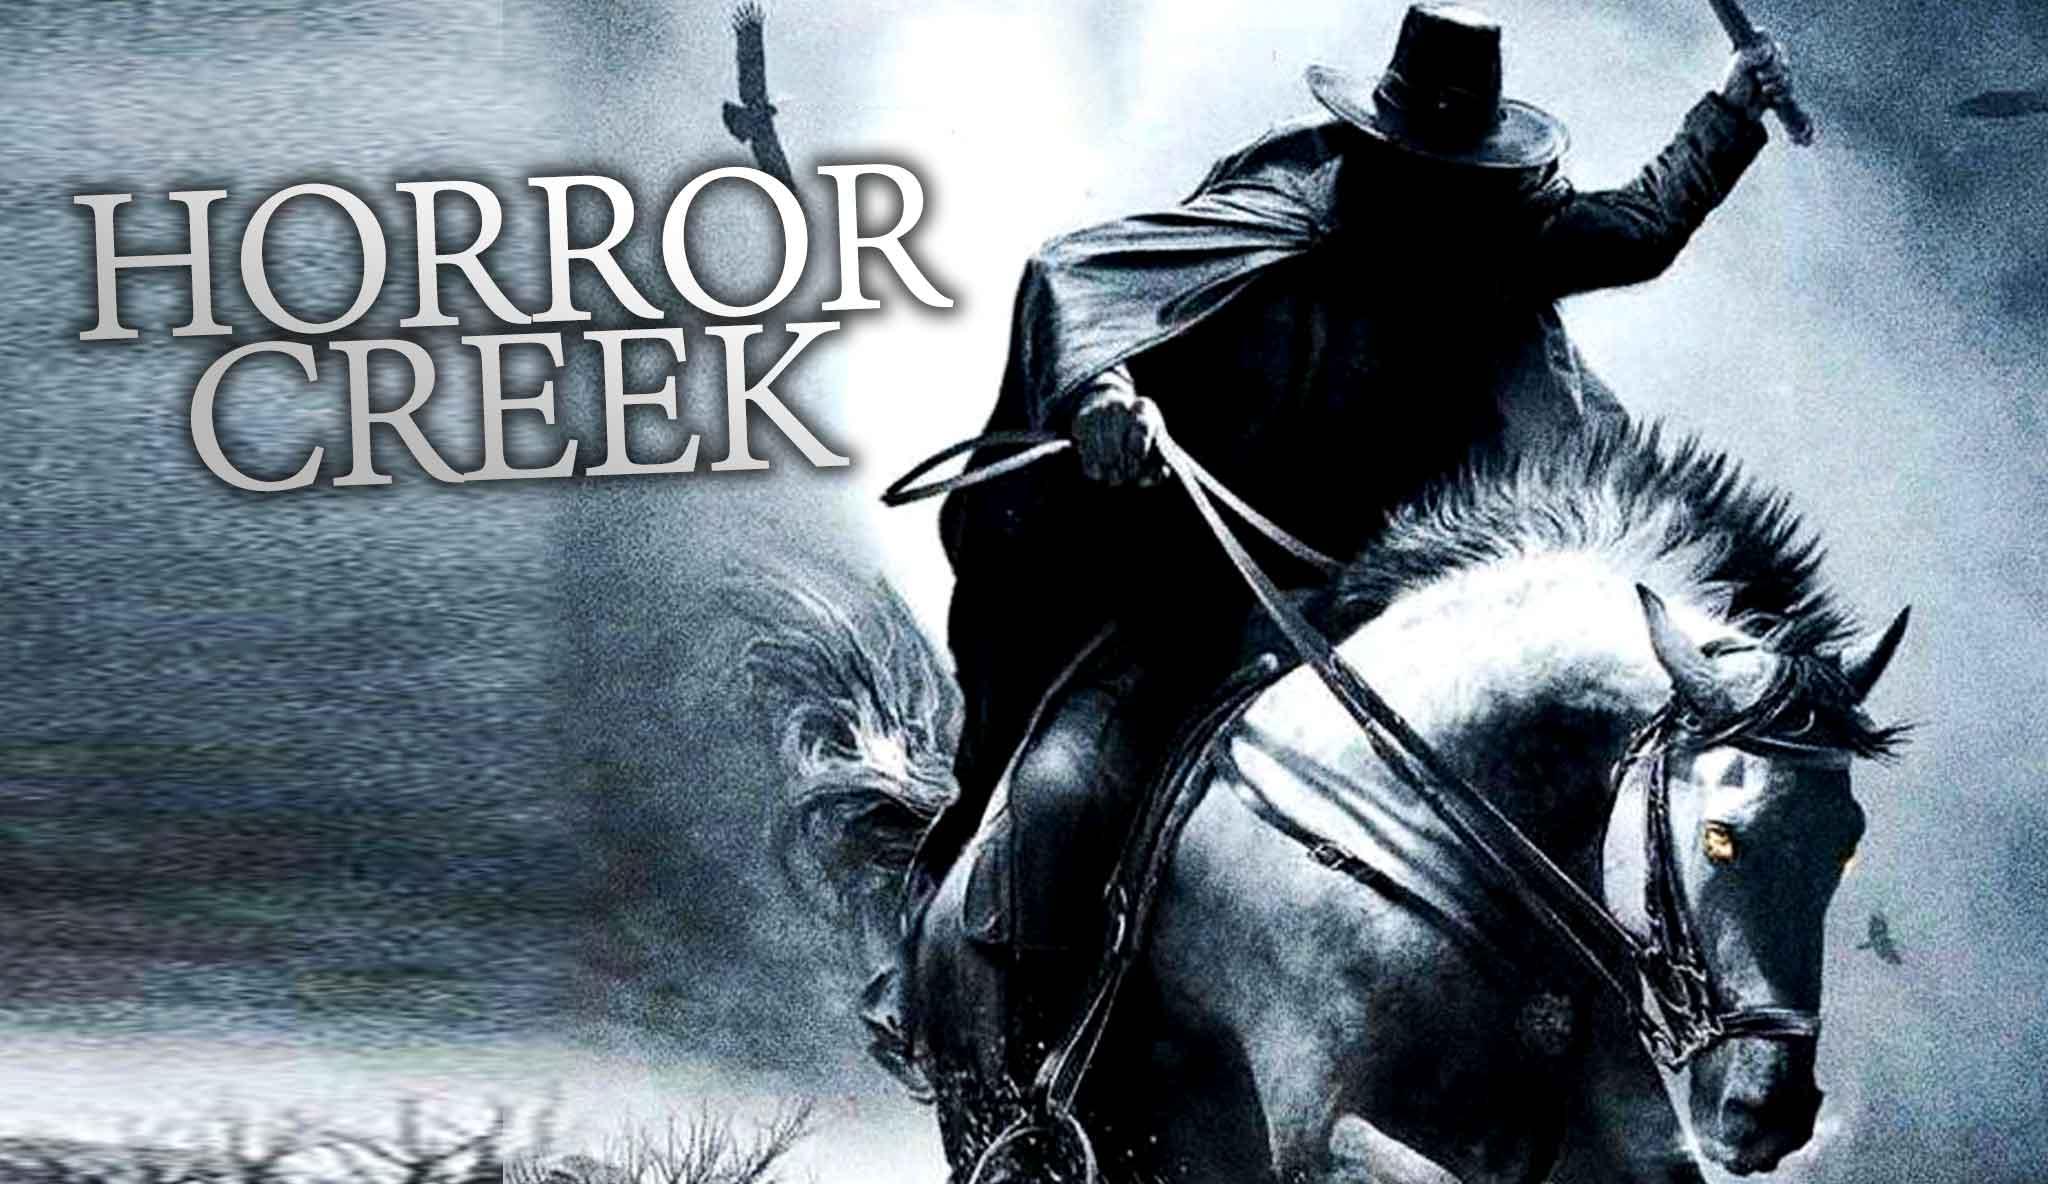 horror-creek-2\header.jpg